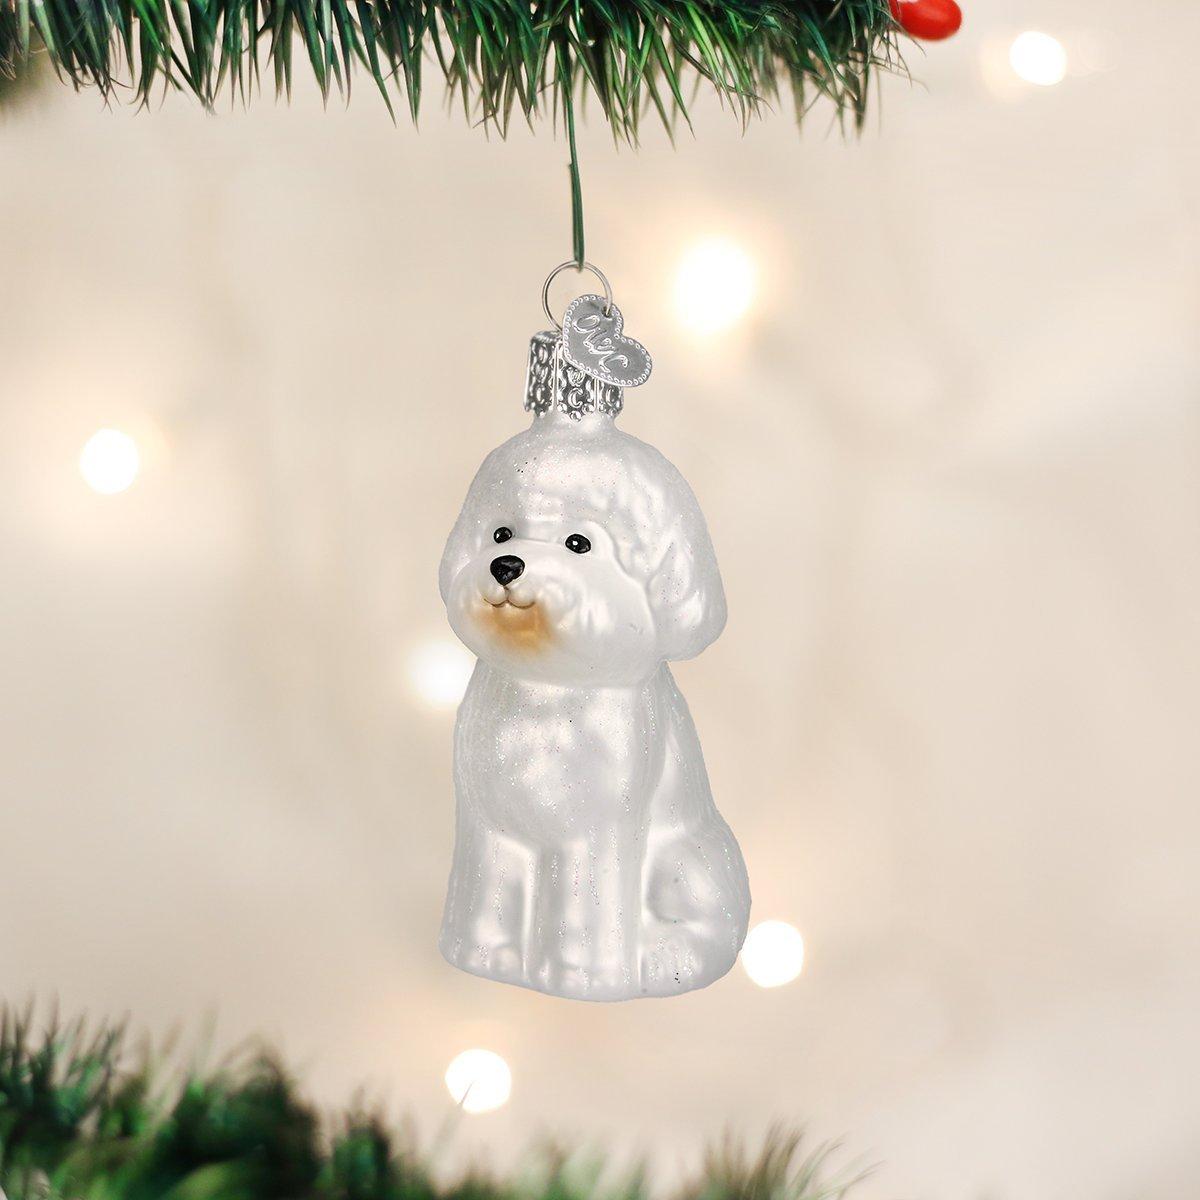 Old World Christmas Bichon Frise Glass Blown Ornament